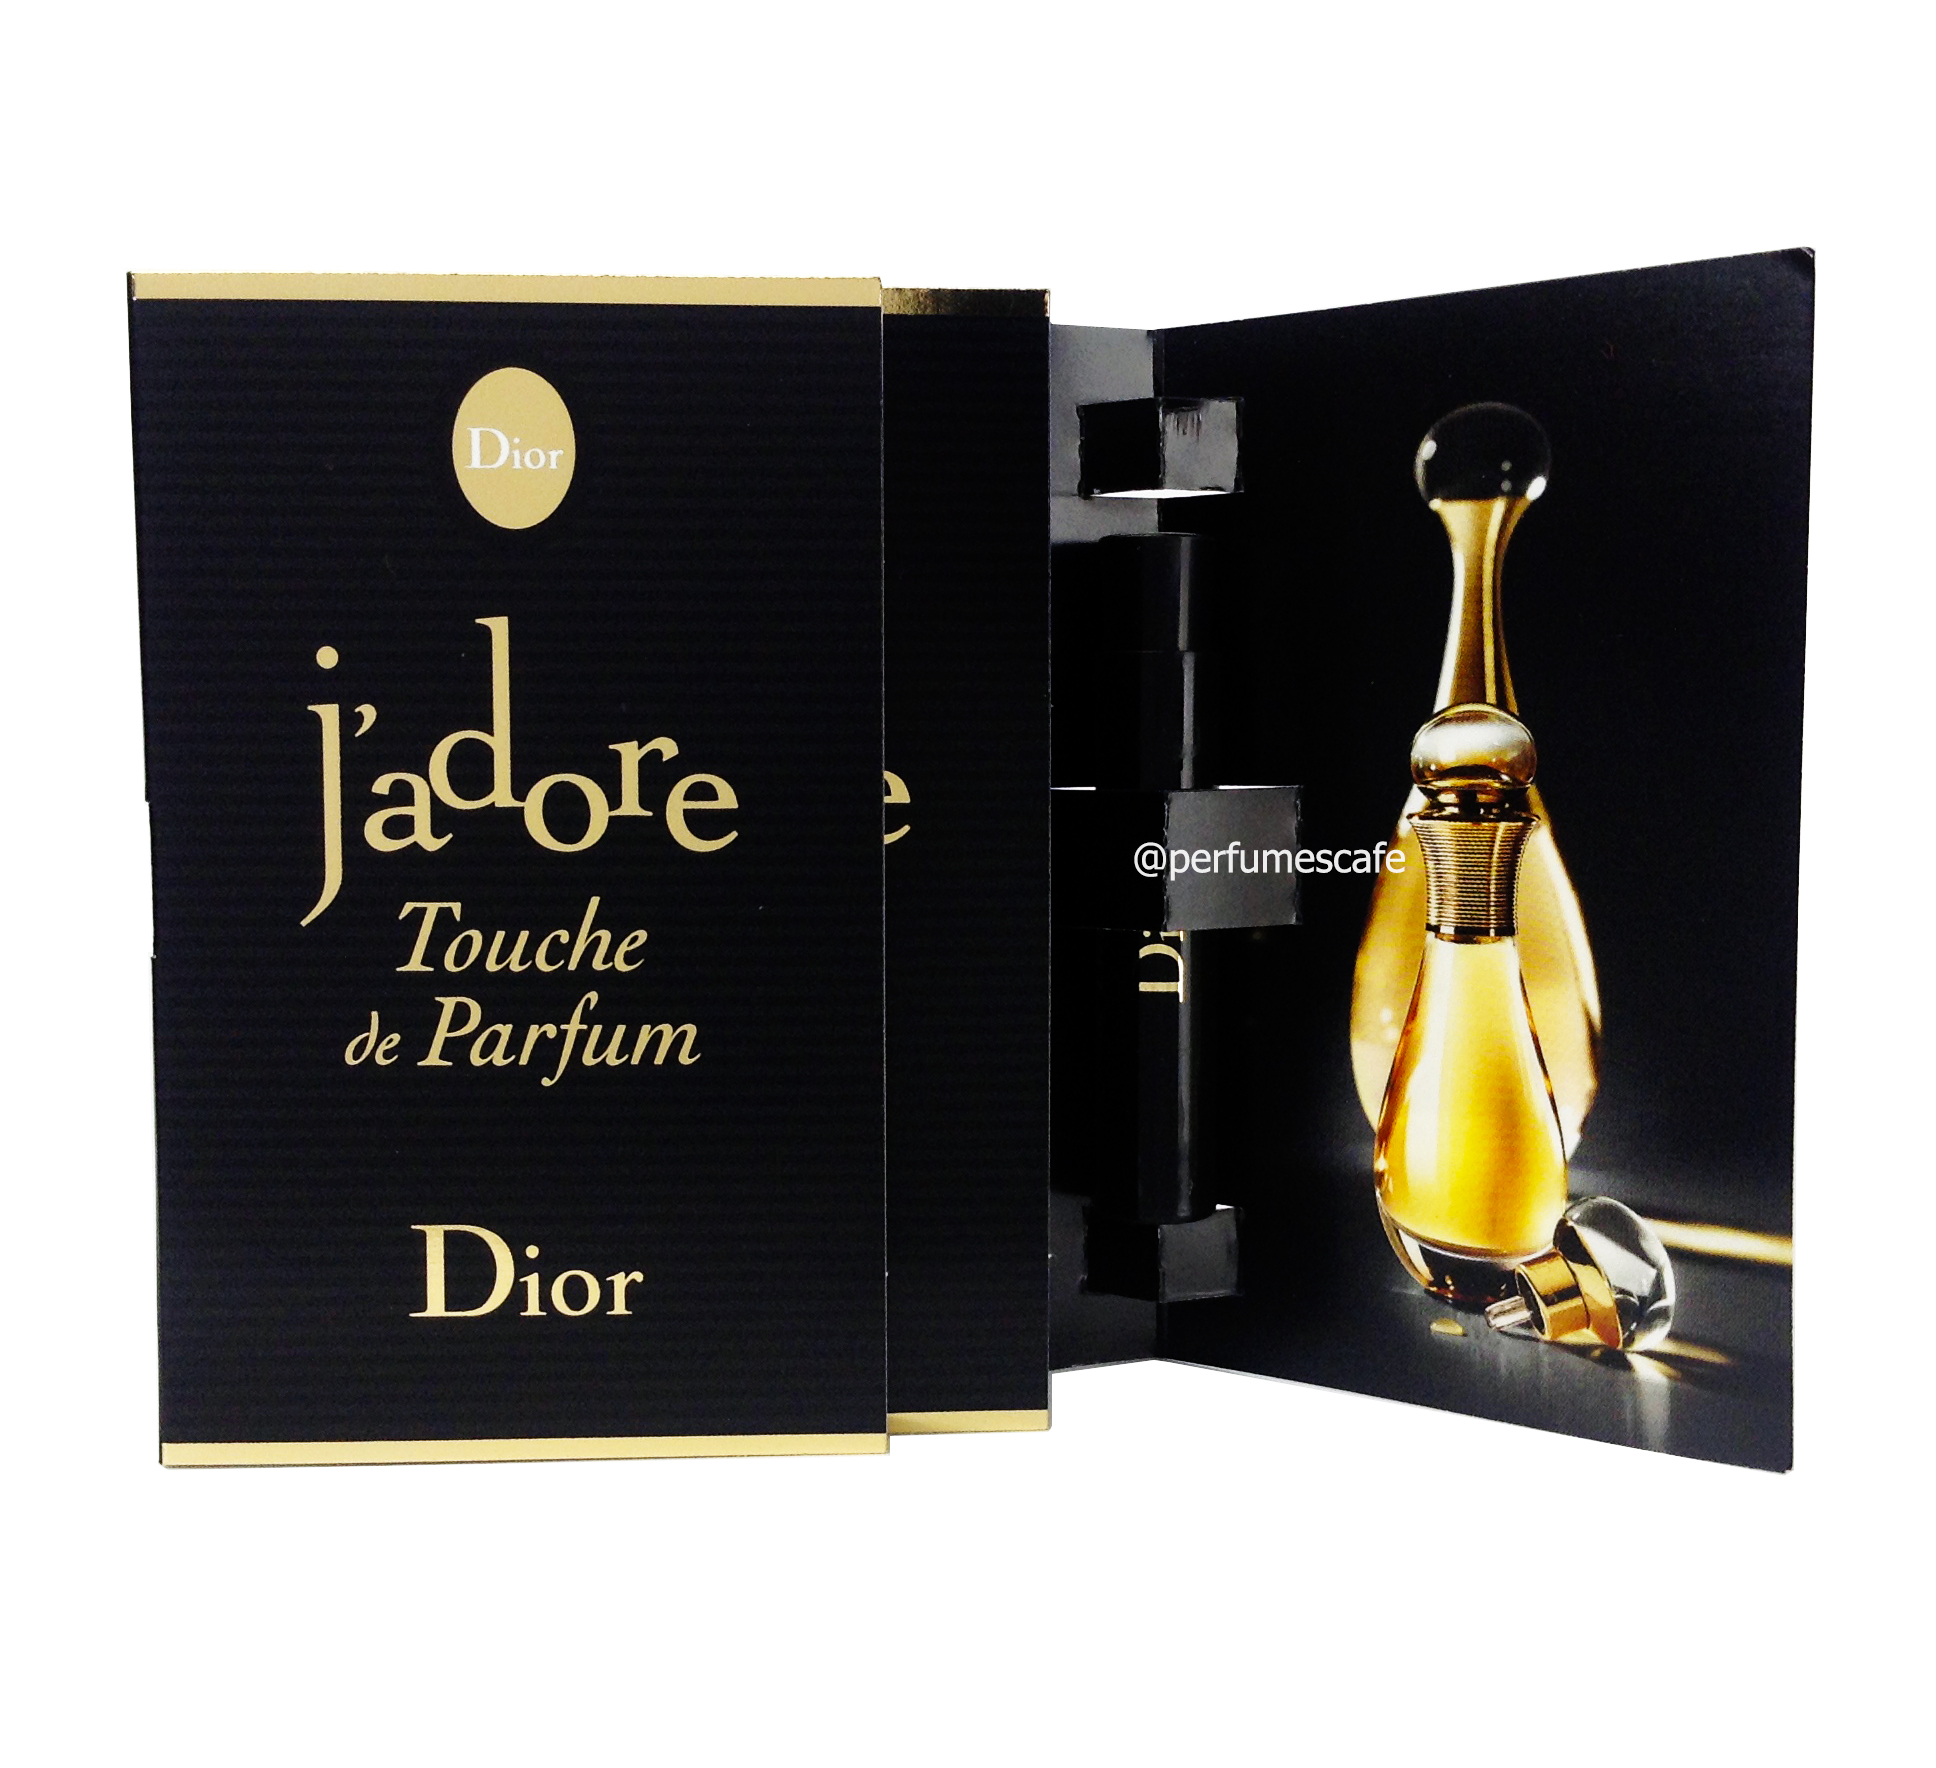 Dior J'adore Touche de Parfum ขนาดทดลอง 1ml.